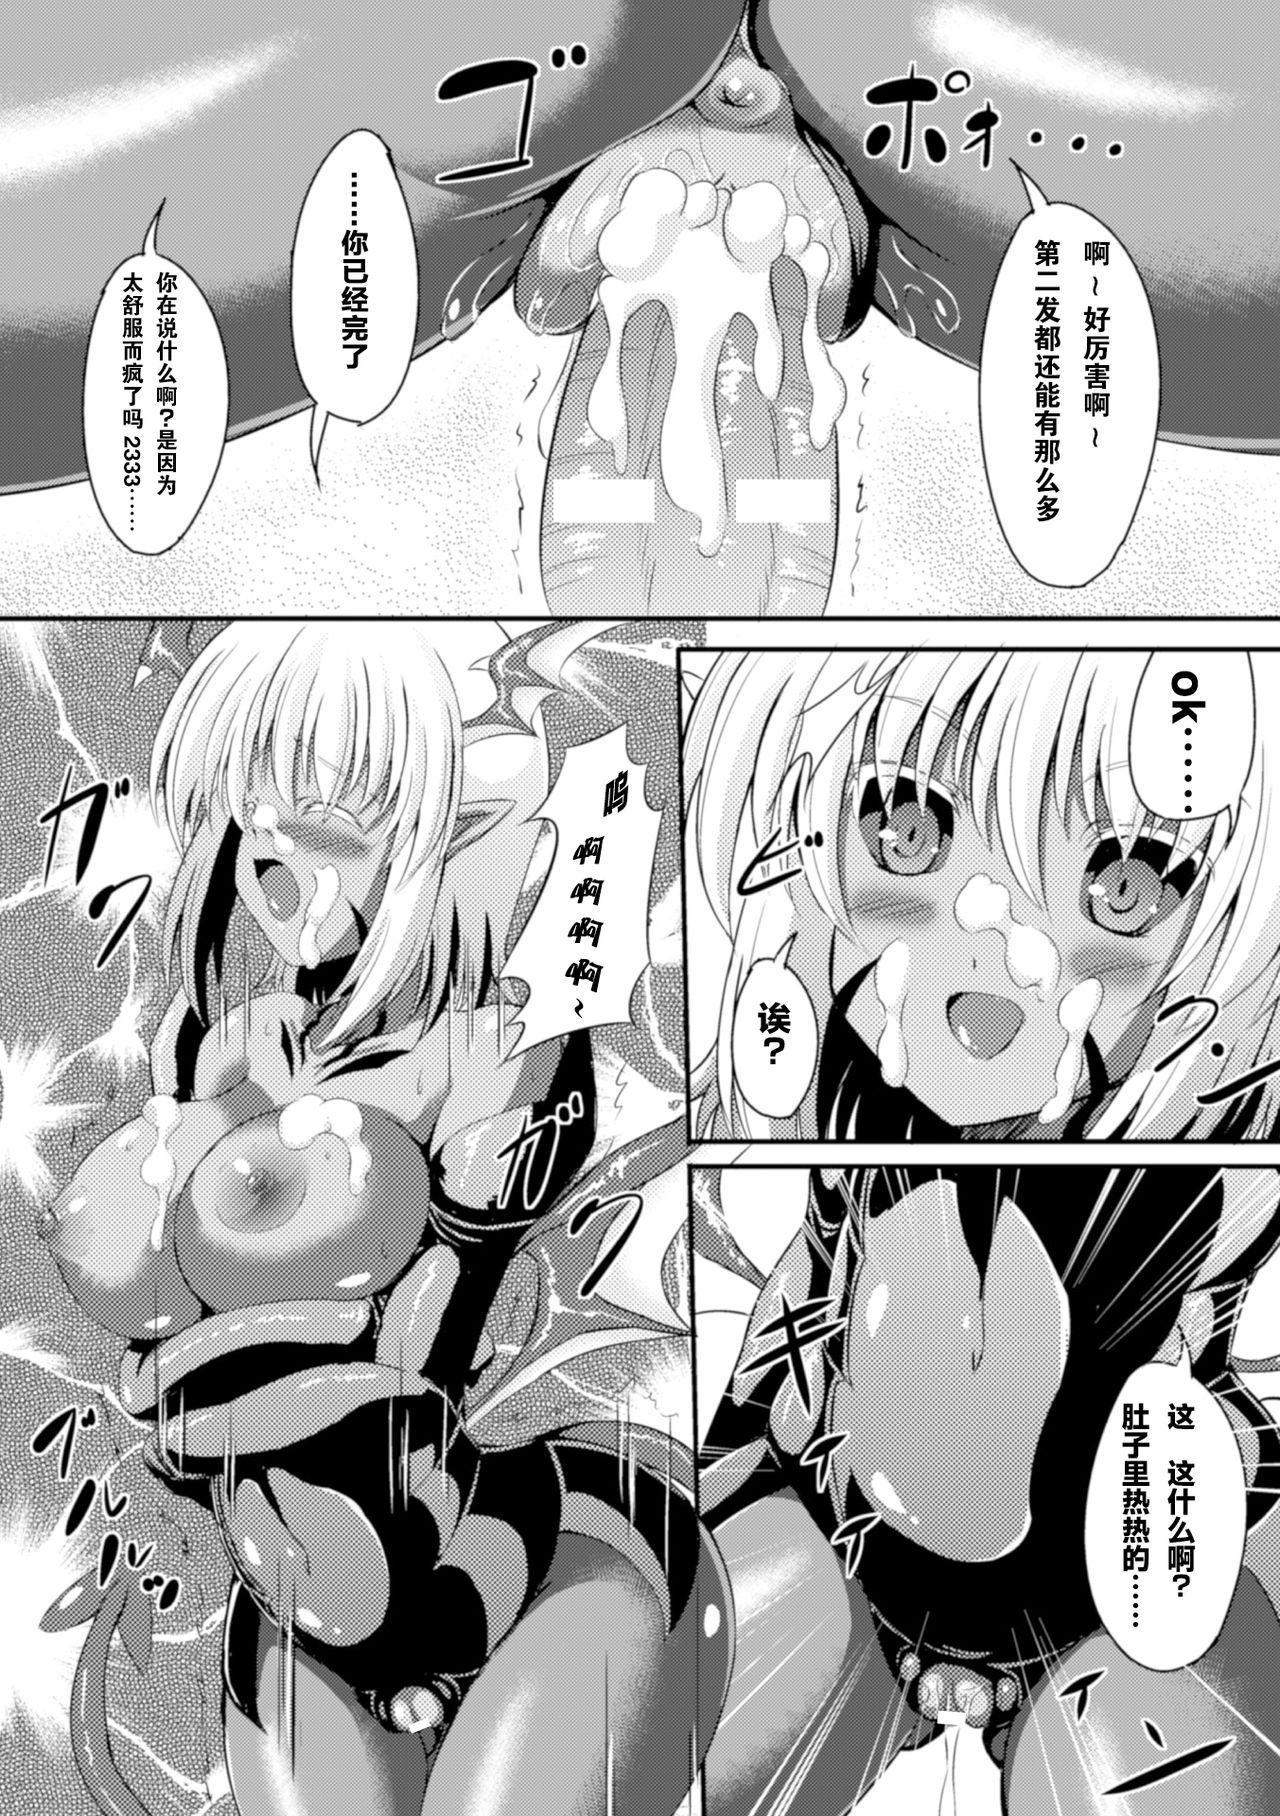 2D Comic Magazine Tenshi ni Ochiru Akuma-tachi Vol. 1 53